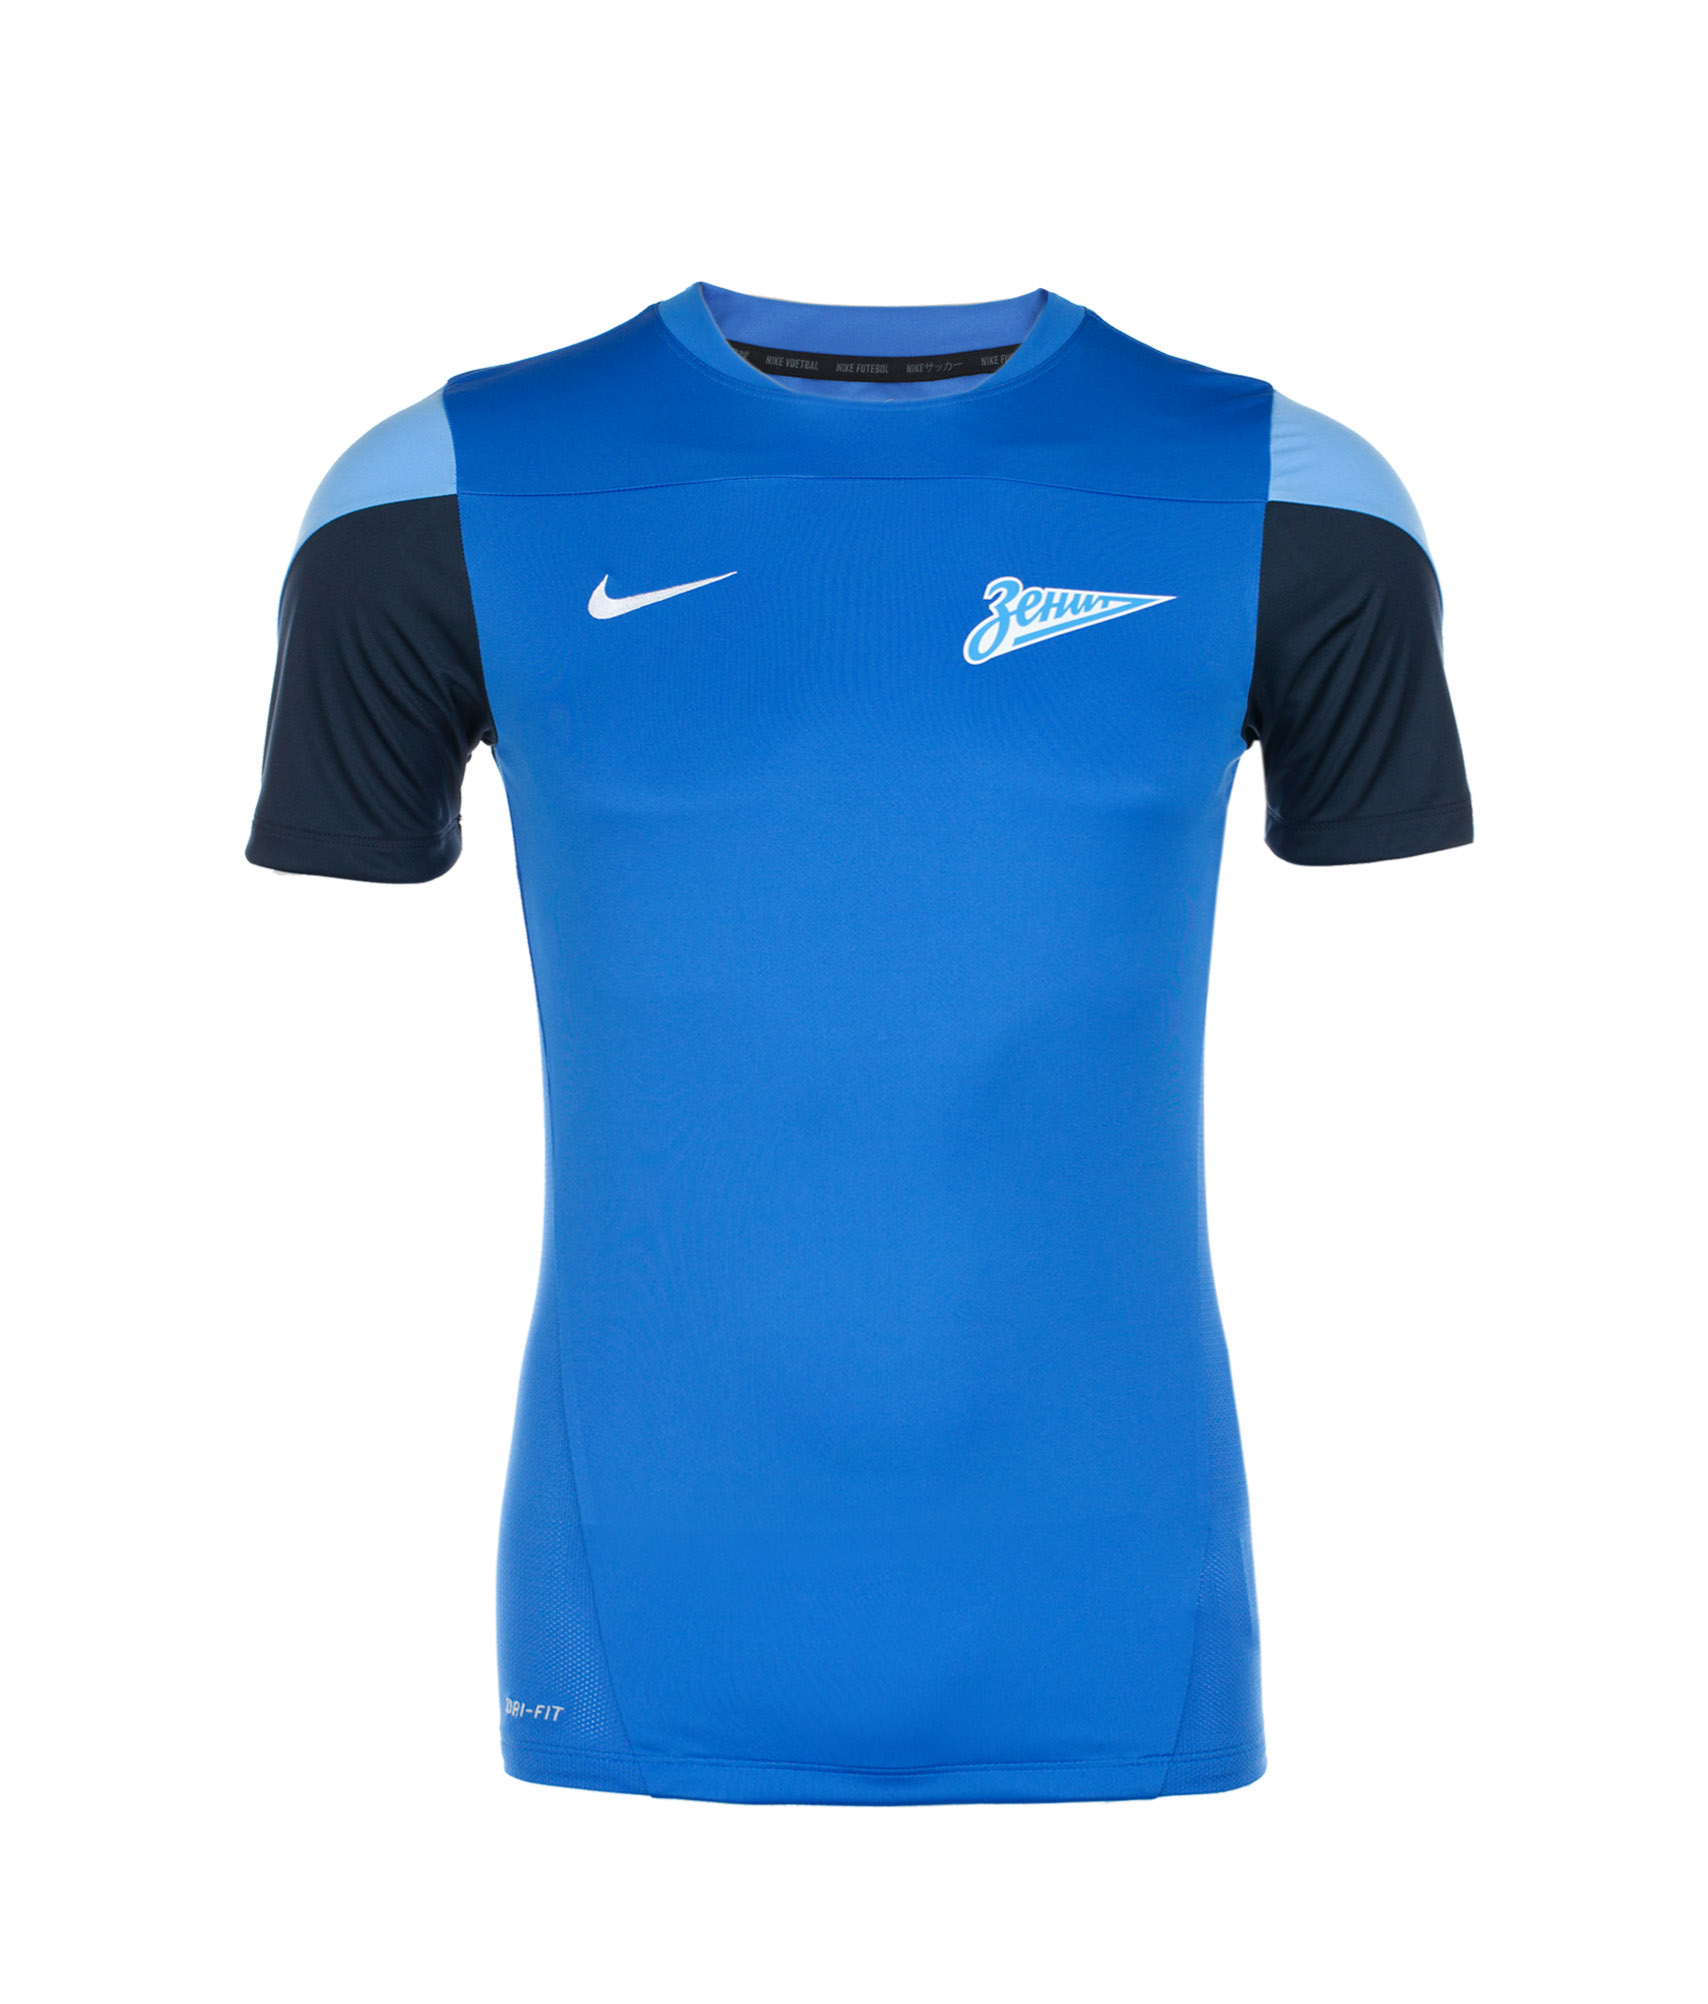 Футболка тренировочная Nike SQUAD SS TRNG TOP, Цвет-Синий, Размер-M